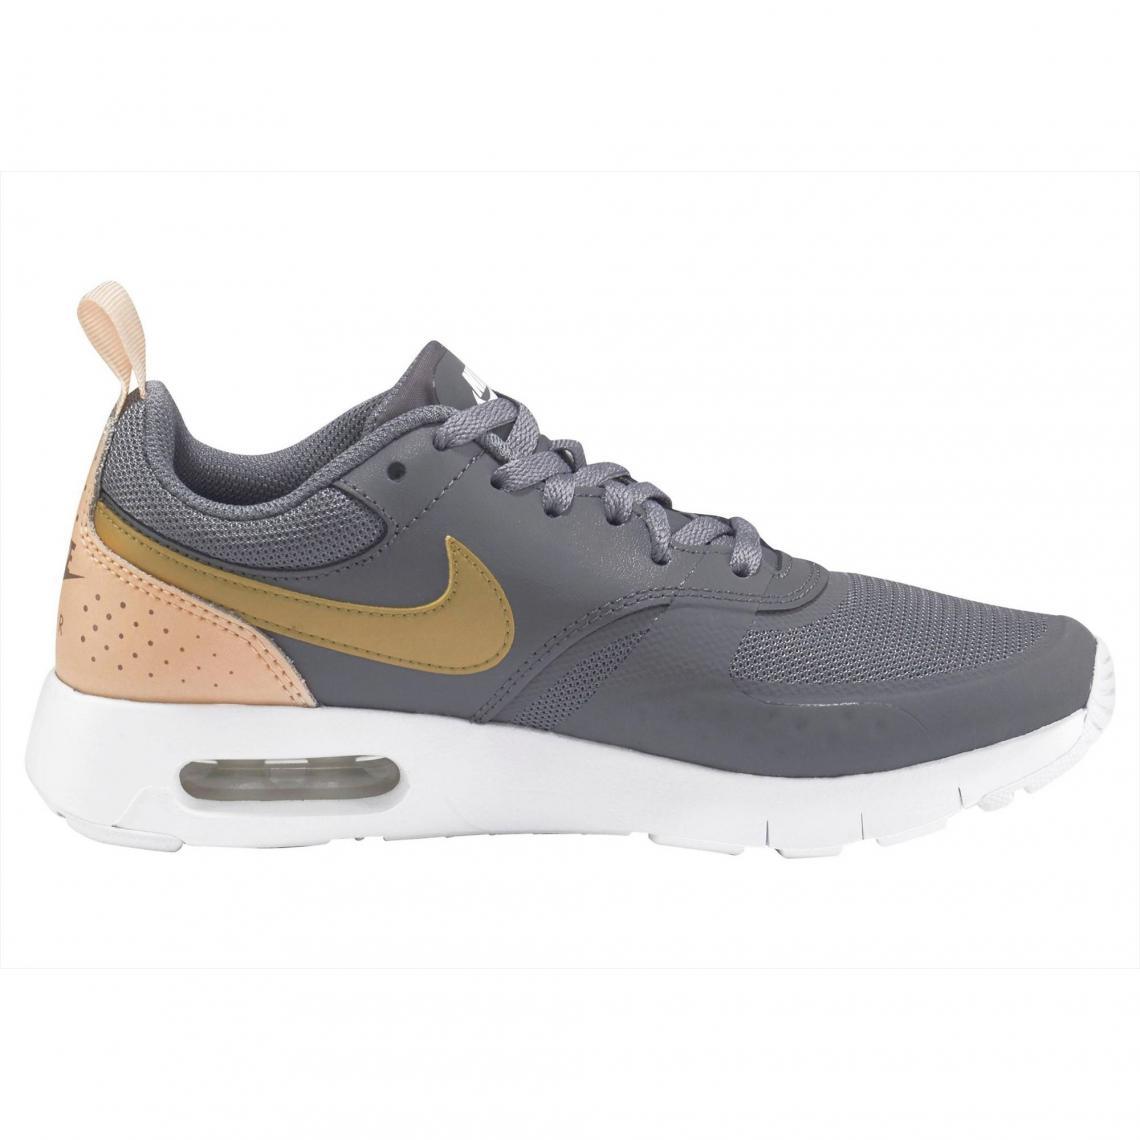 fe57dd4fe3049 Baskettes fille Air Max Vision de Nike - Gris   or